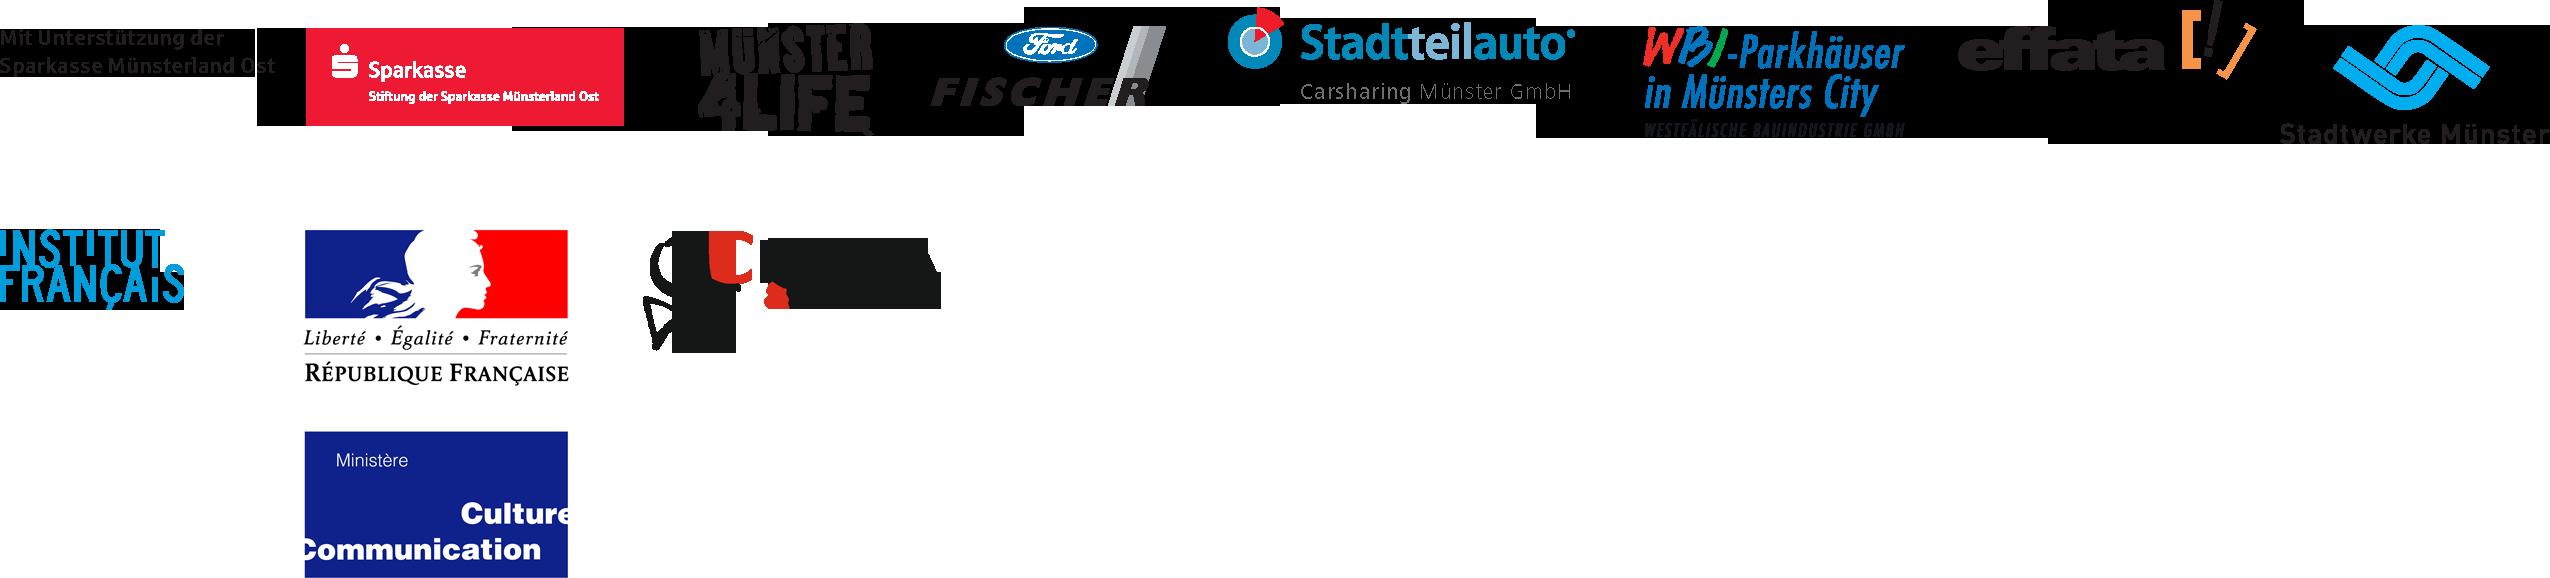 Logos: Stiftung der Sparkasse Münsterland Ost | Münster4Life | Ford Fischer | Stadtteilauto | Westfälische Bauindustrie GmbH | effata [!] | Stadtwerke Münster | Institut Français | République Française, Ministère Culture Communication